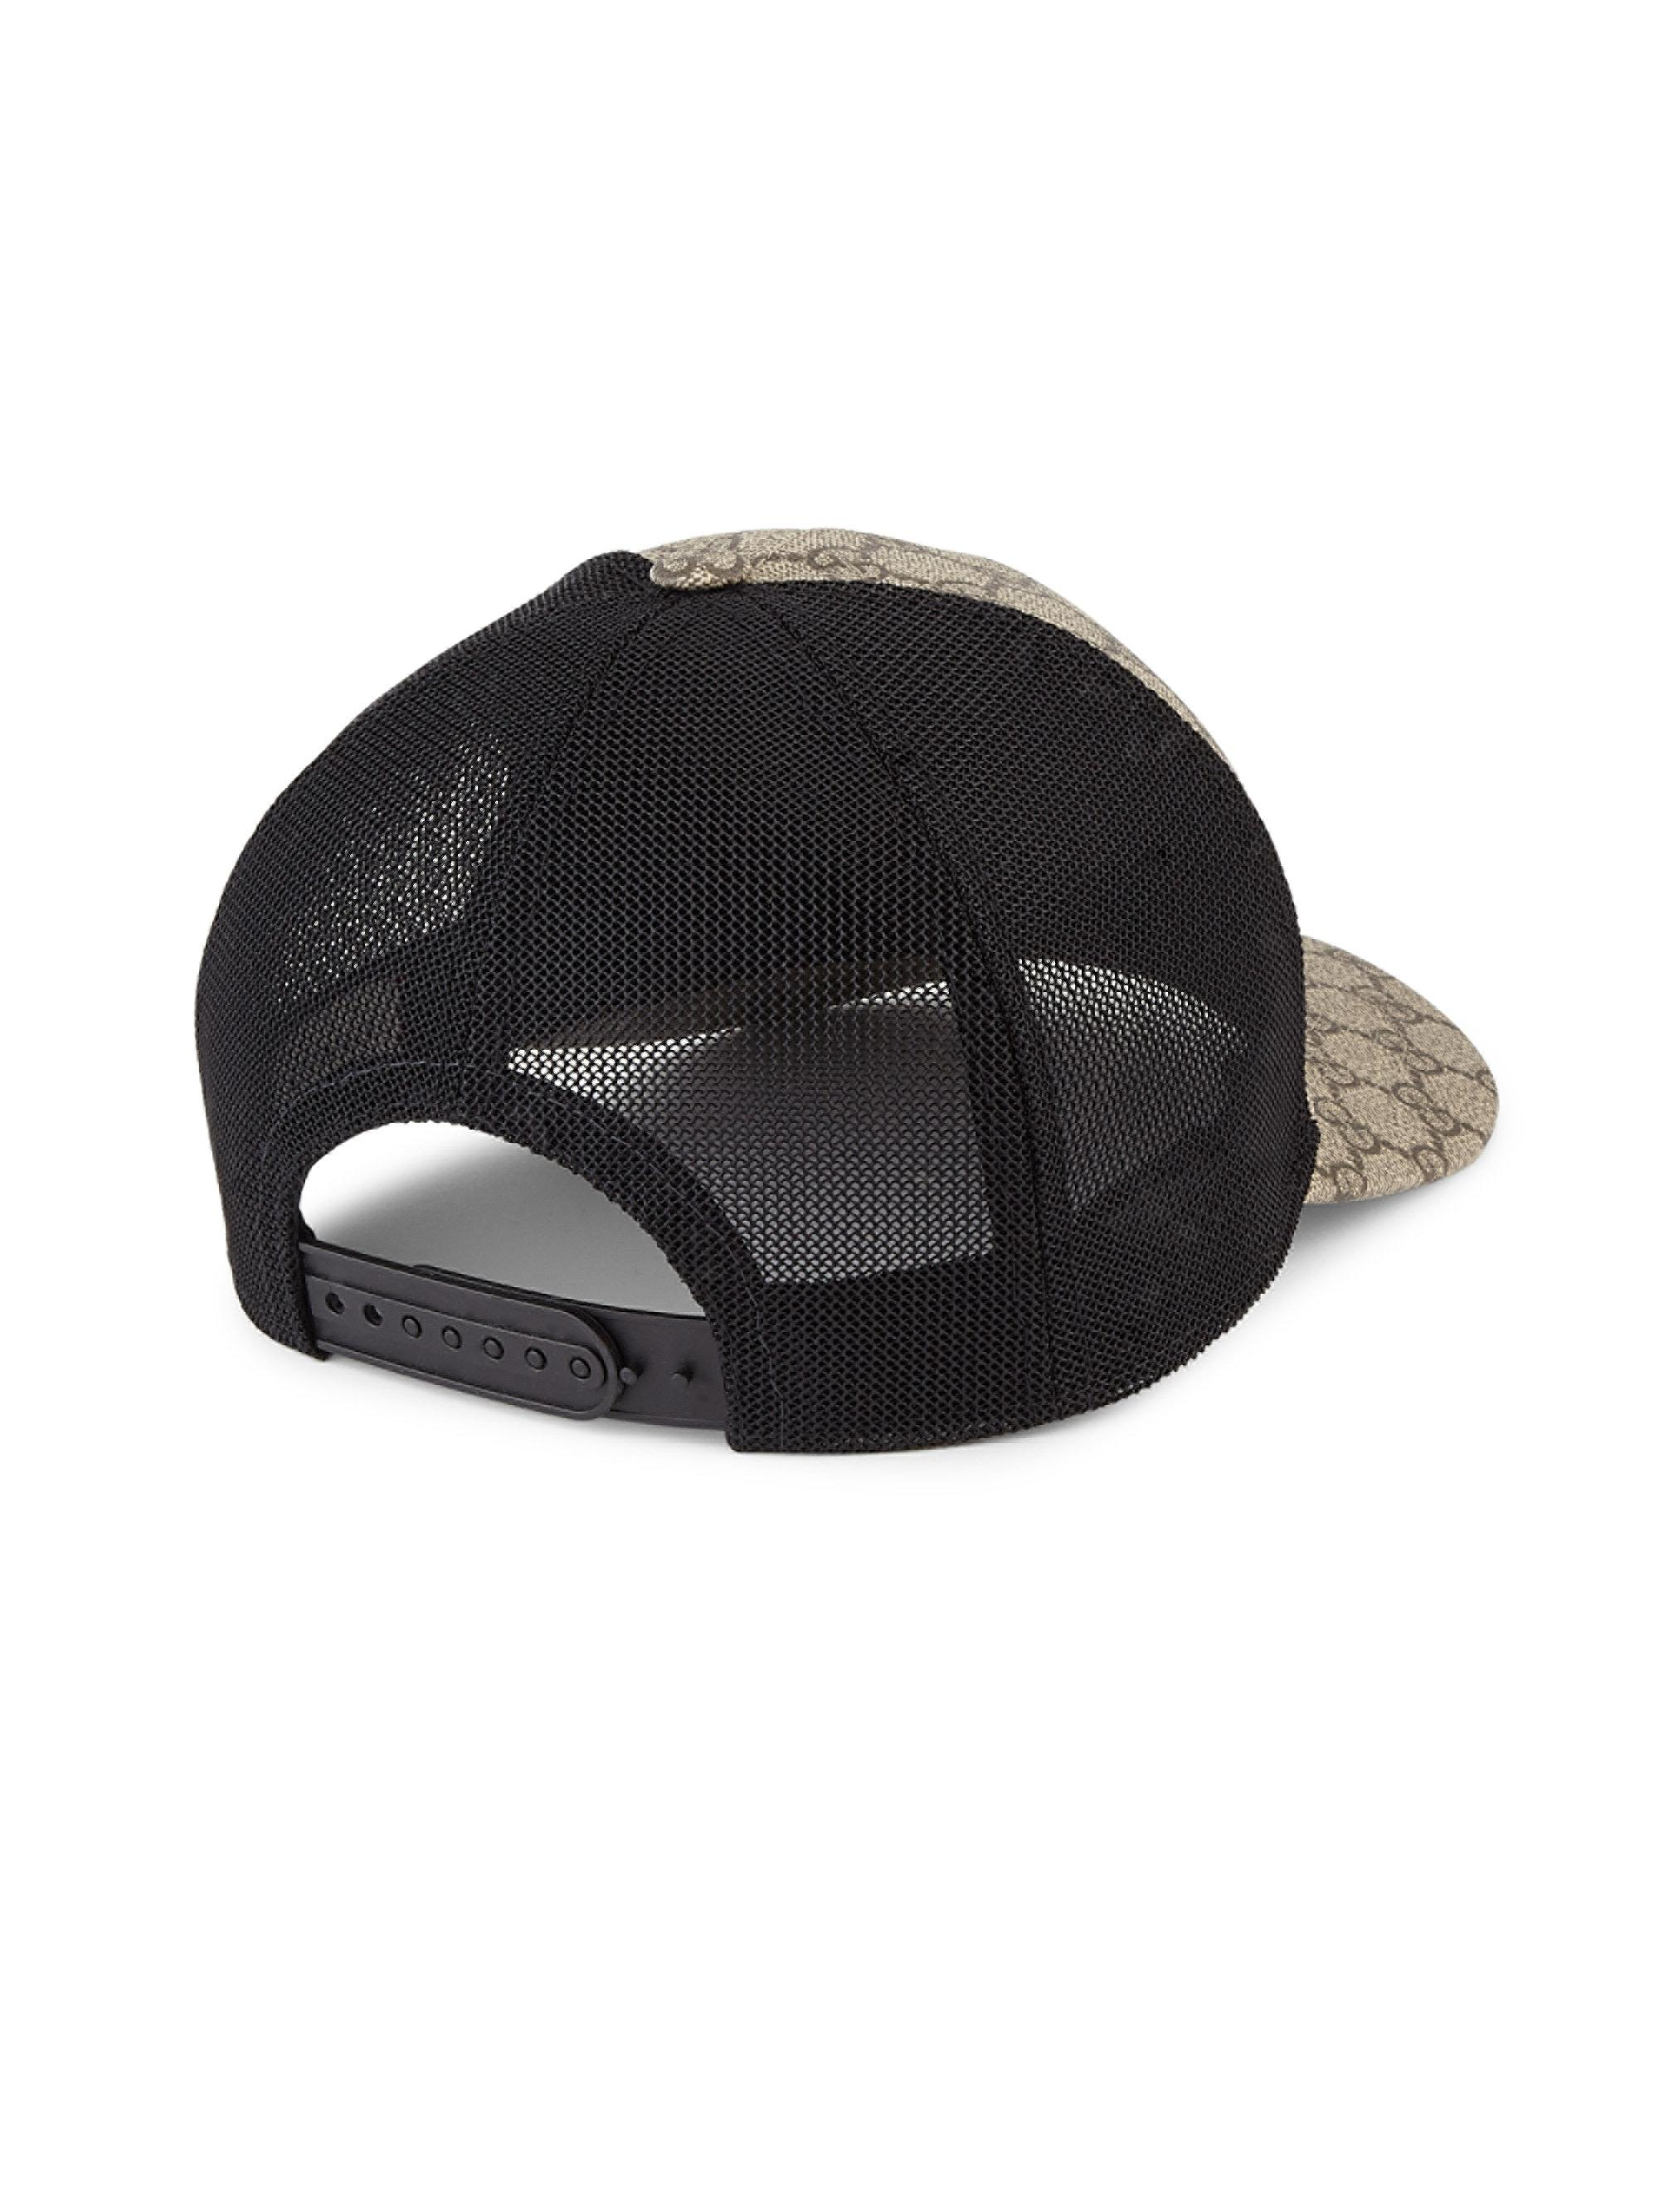 Gucci Gg Supreme Canvas Baseball Cap for Men - Lyst cb43d0325b1